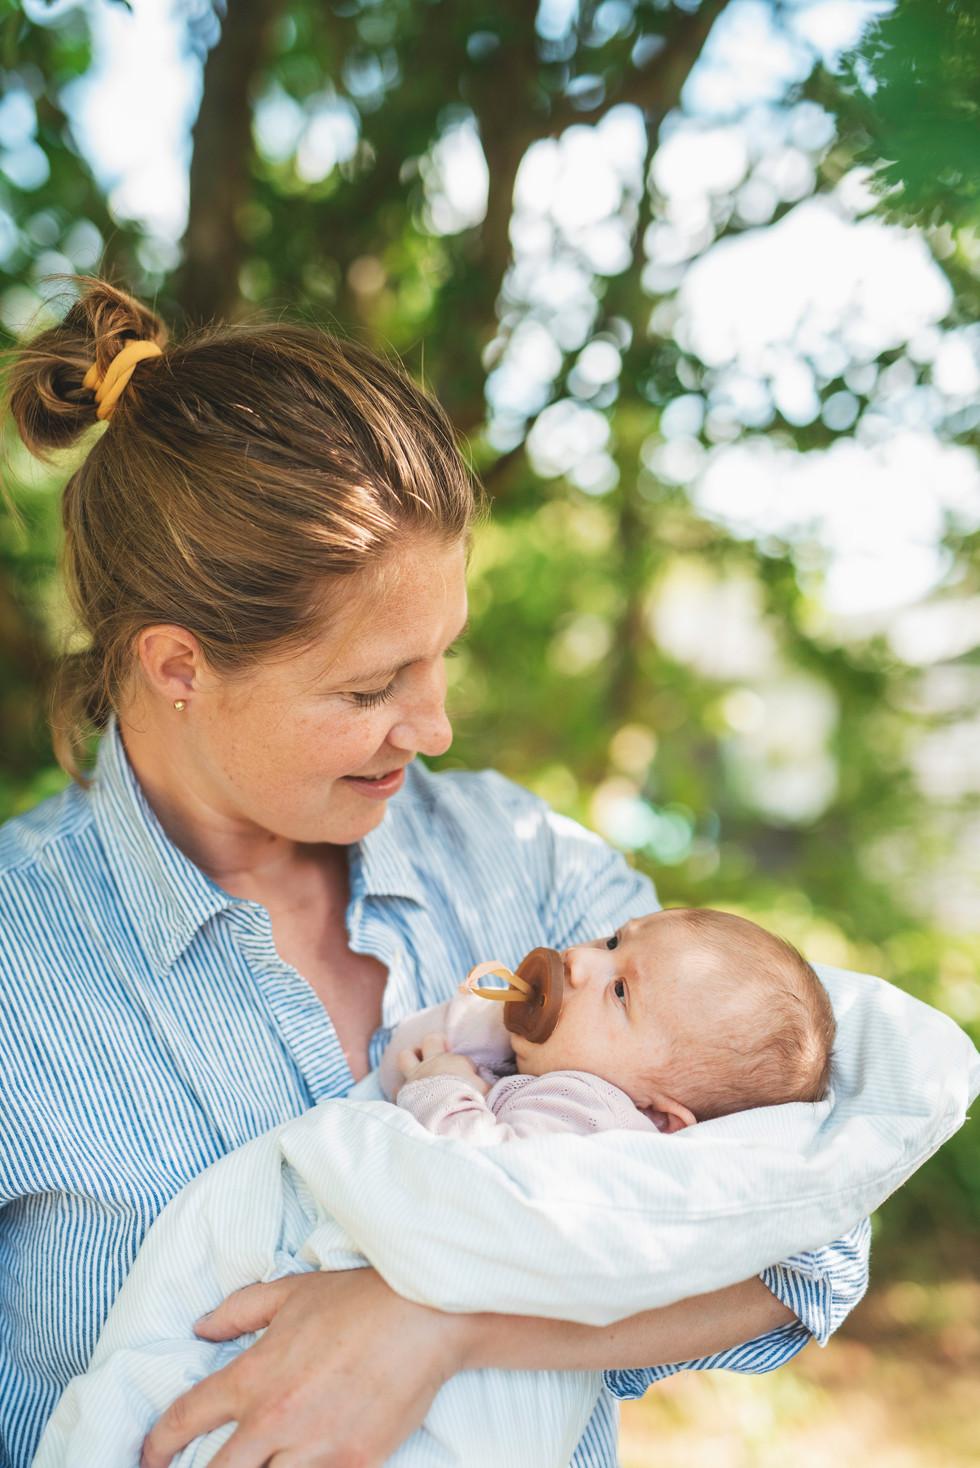 Ingeborg & mother